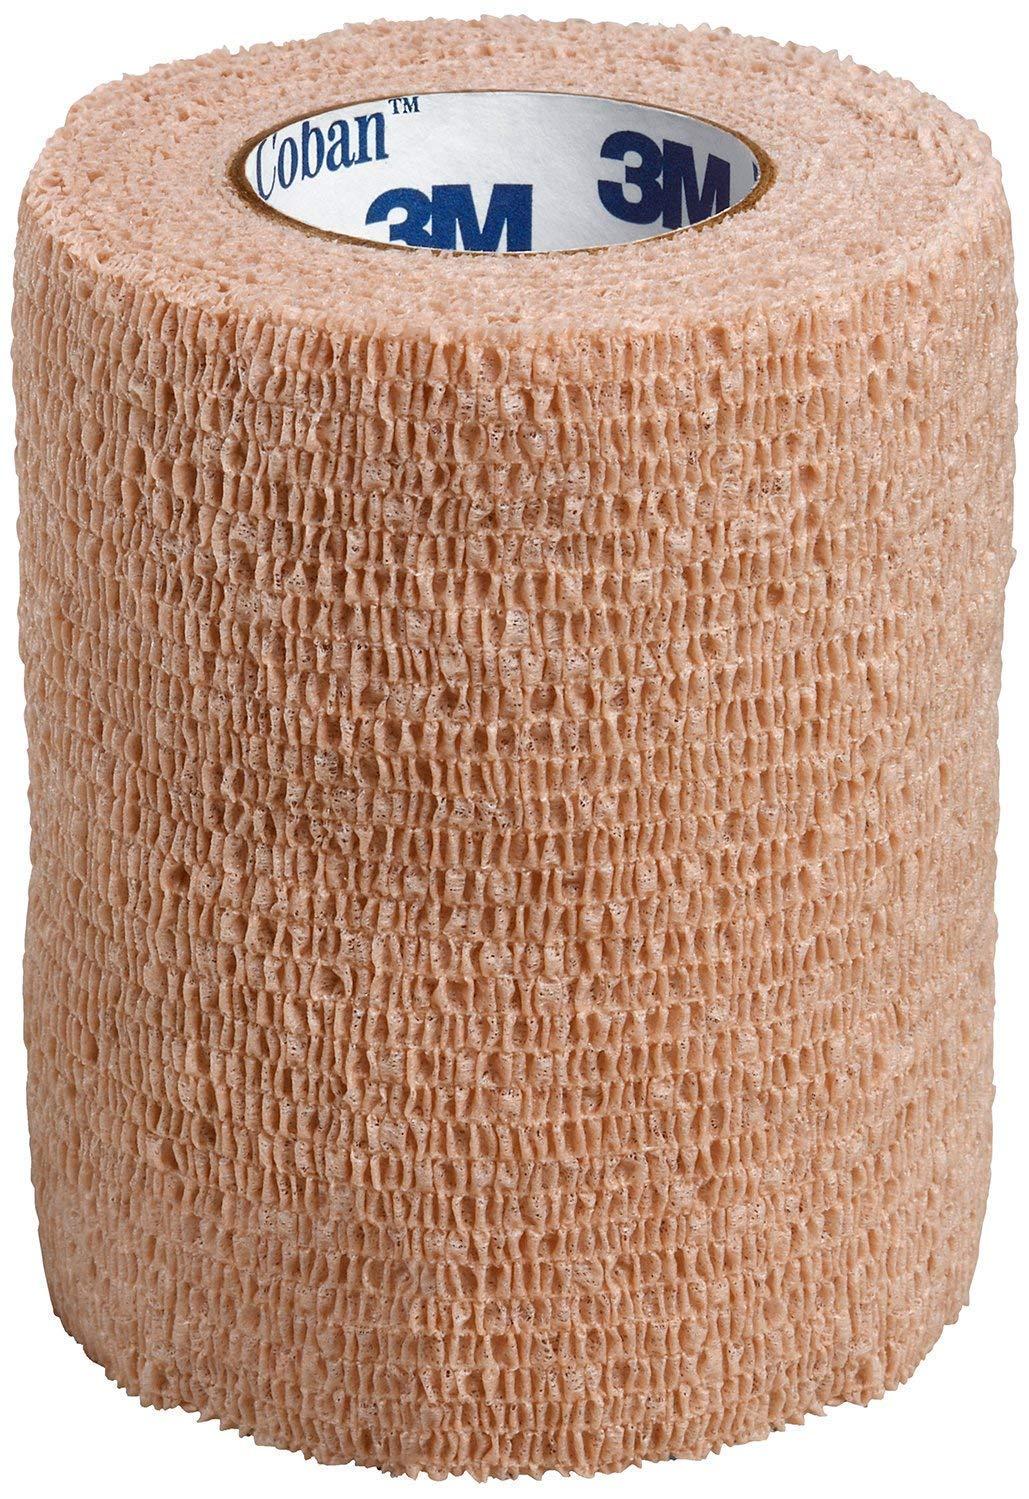 3M Coban Self- Adherent Wrap, 3''x 5yds, Box of 24 Rolls, Tan